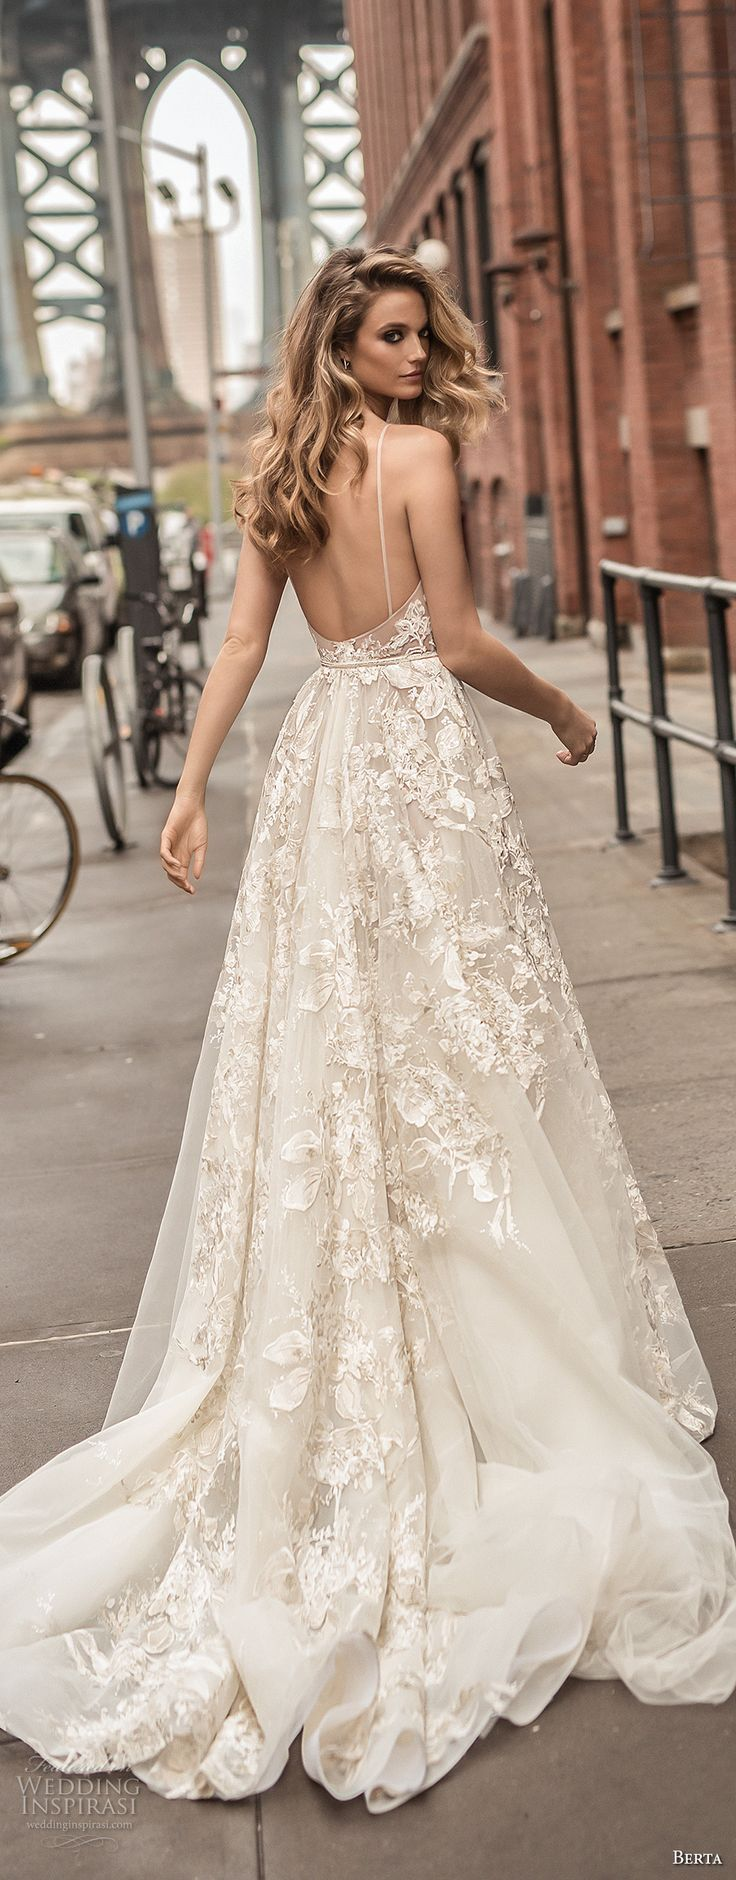 Berta Spring 2018 Wedding Dresses — Campaign Photos | Pinterest ...